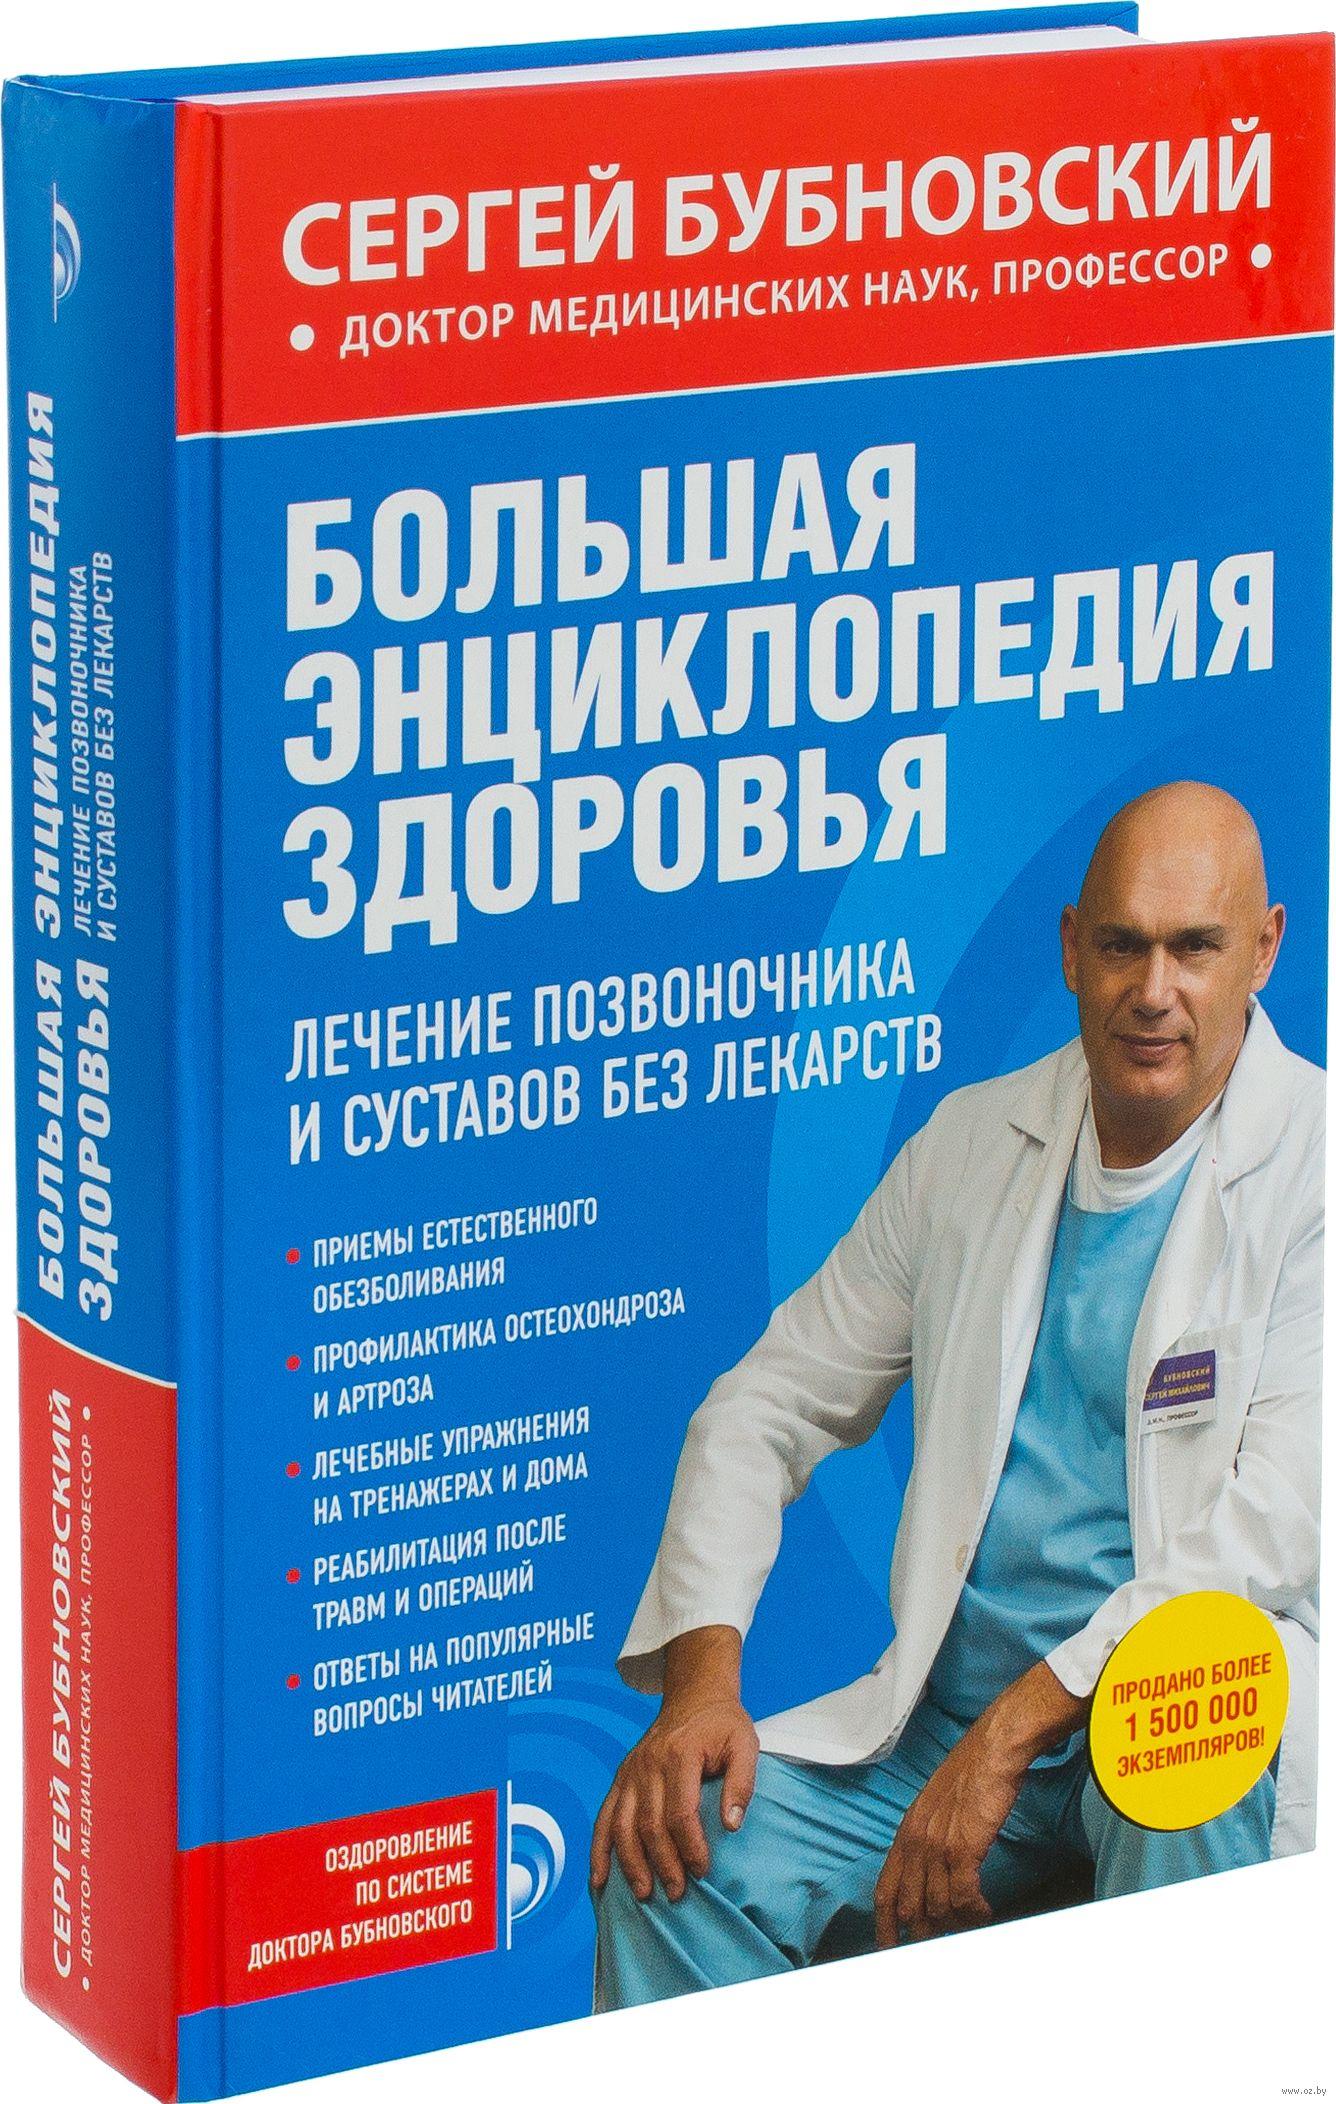 обезболивающие лекарства при болях в суставах и мышцах